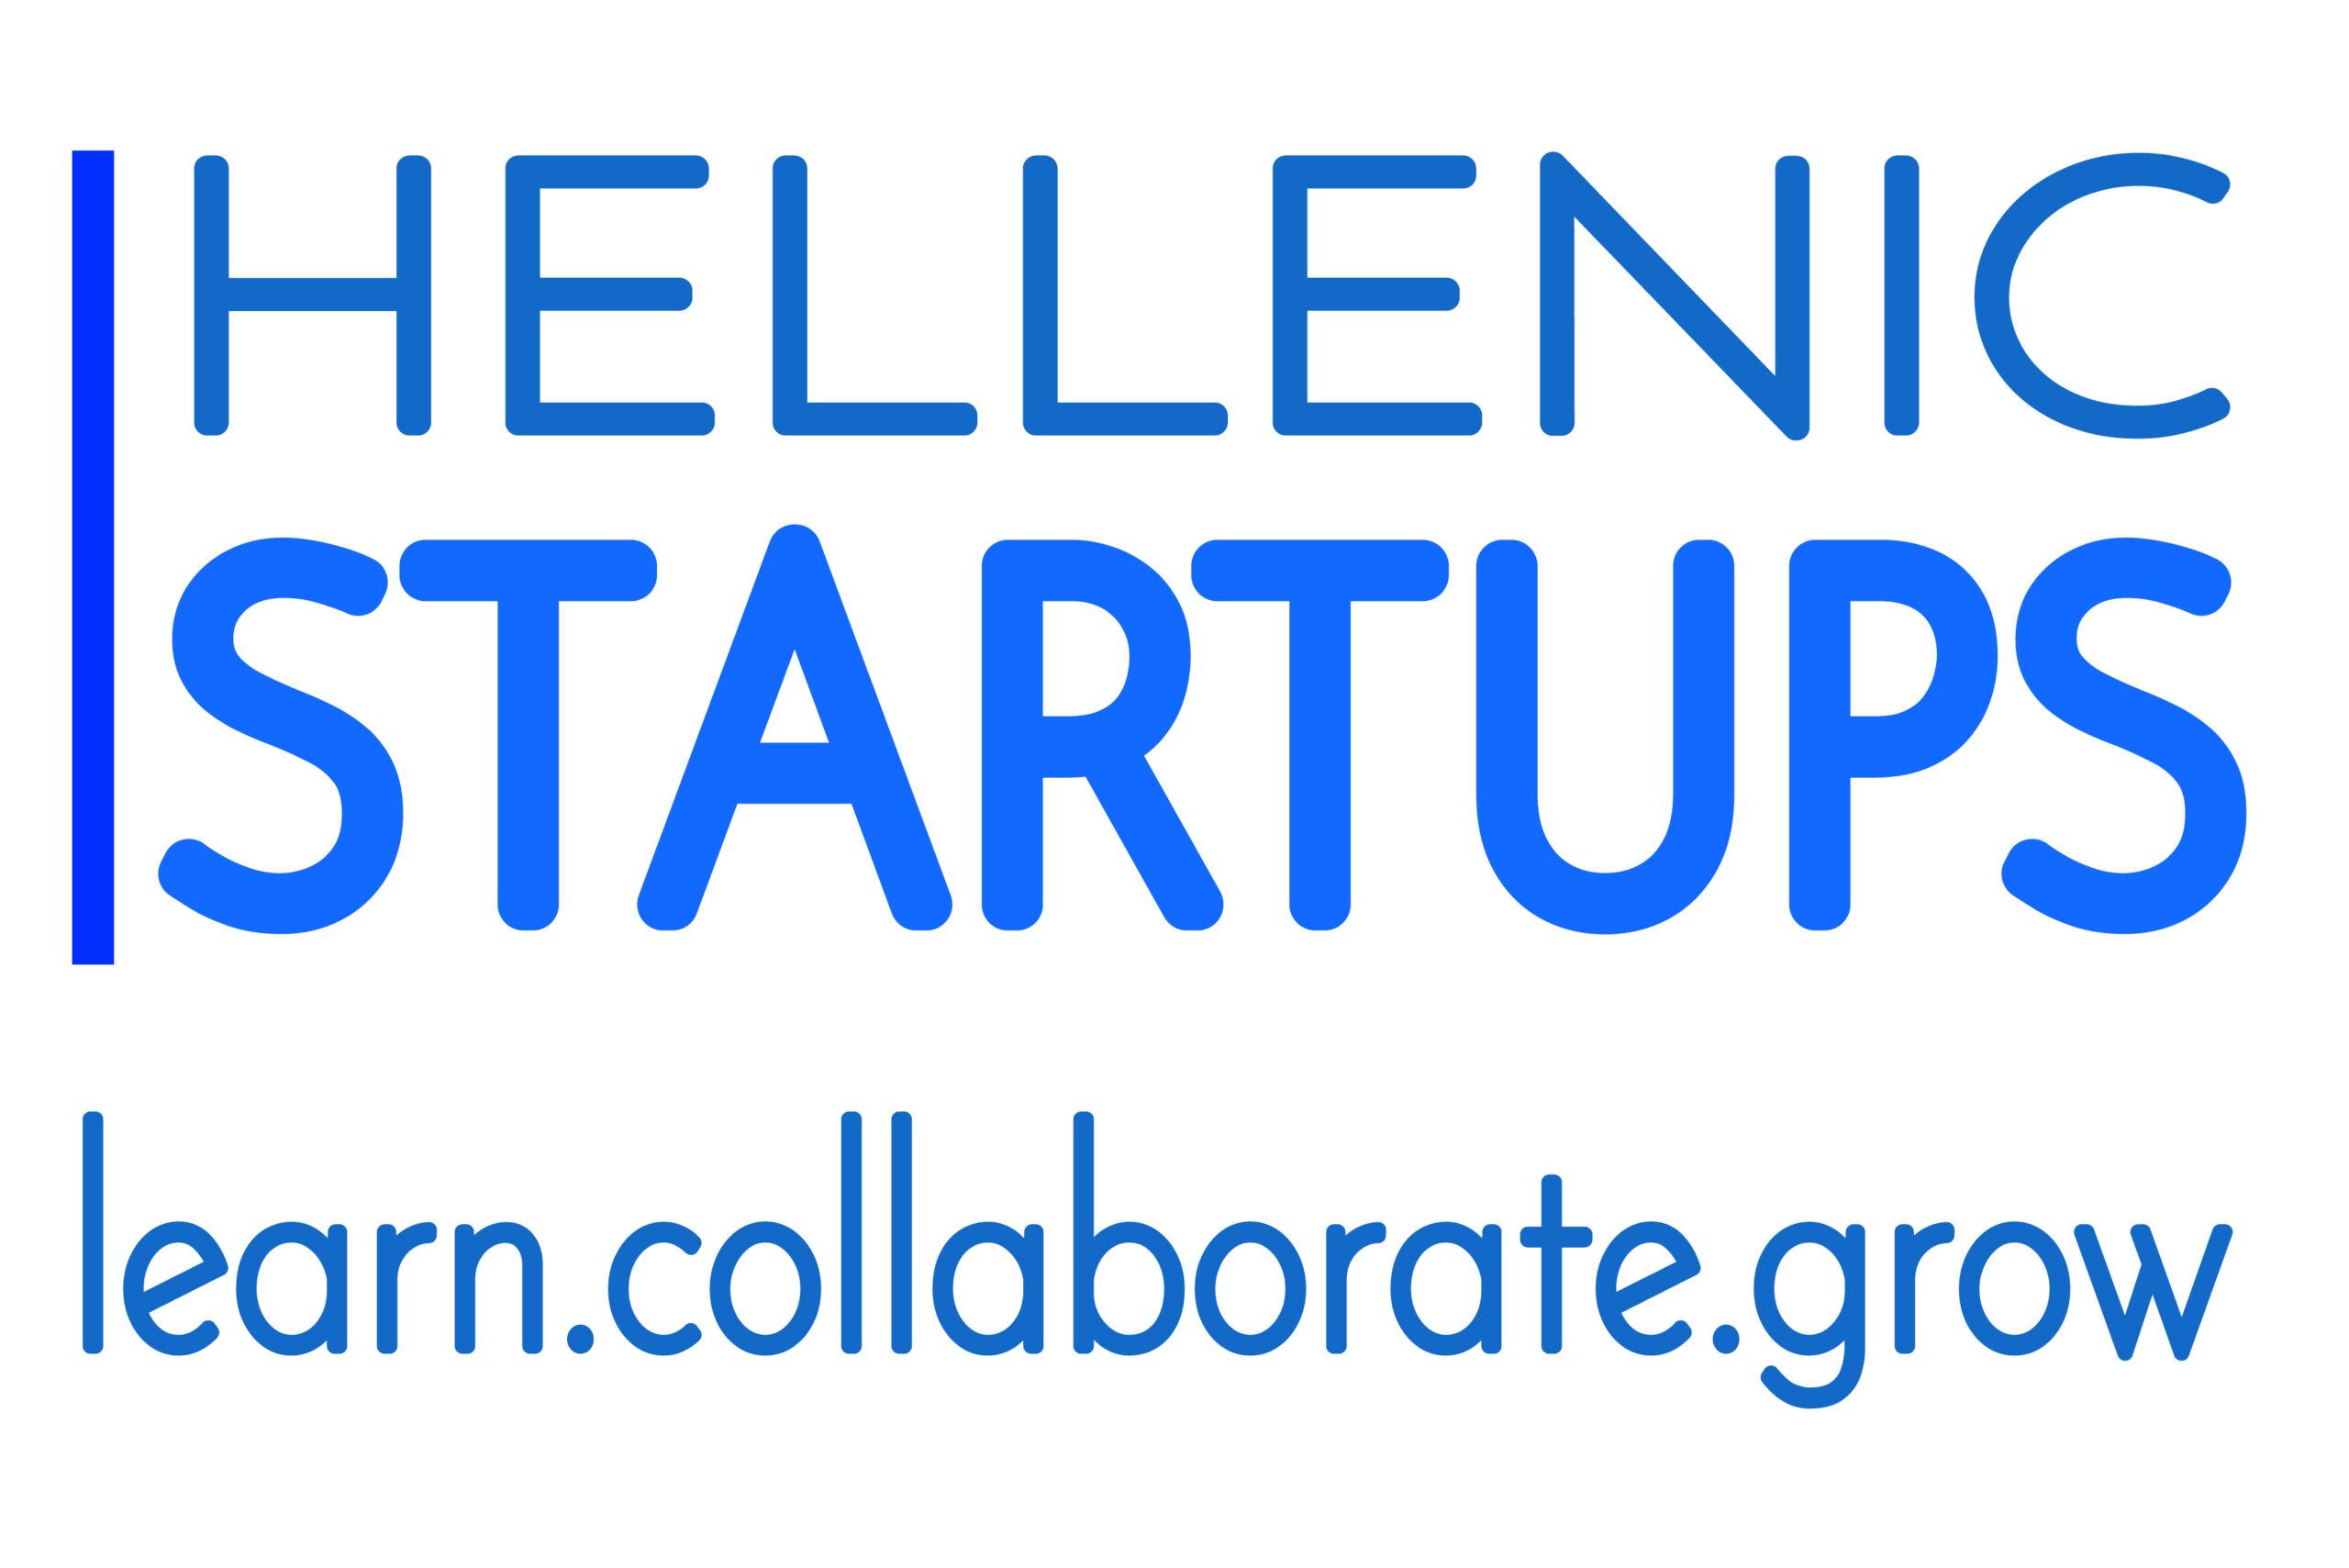 Hellenic Startups